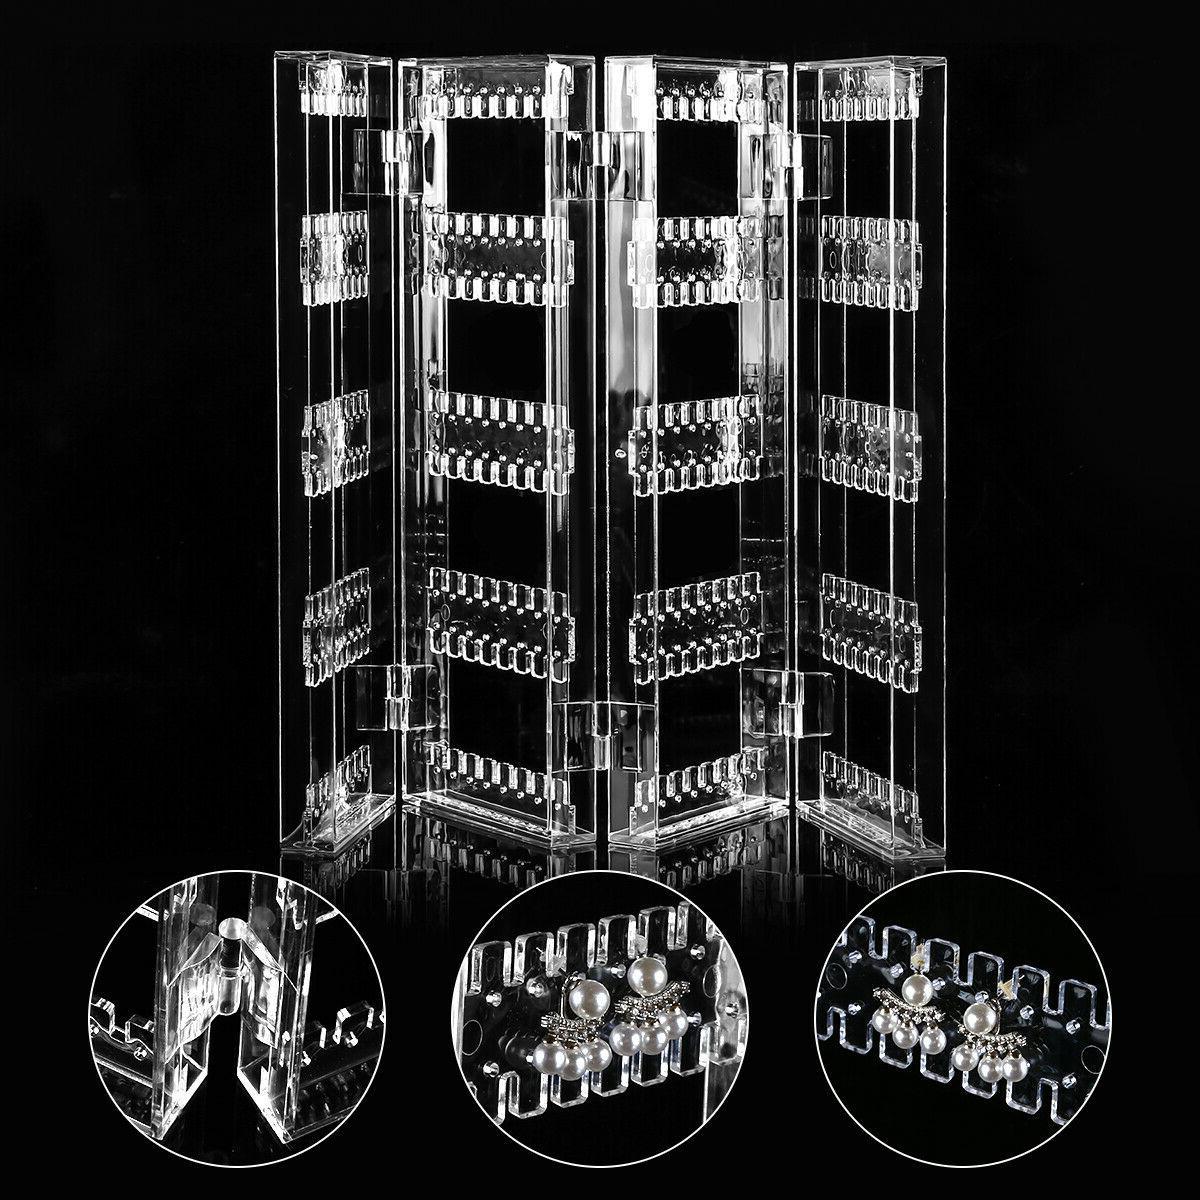 Earrings Jewelry Display Rack Stand Organizer